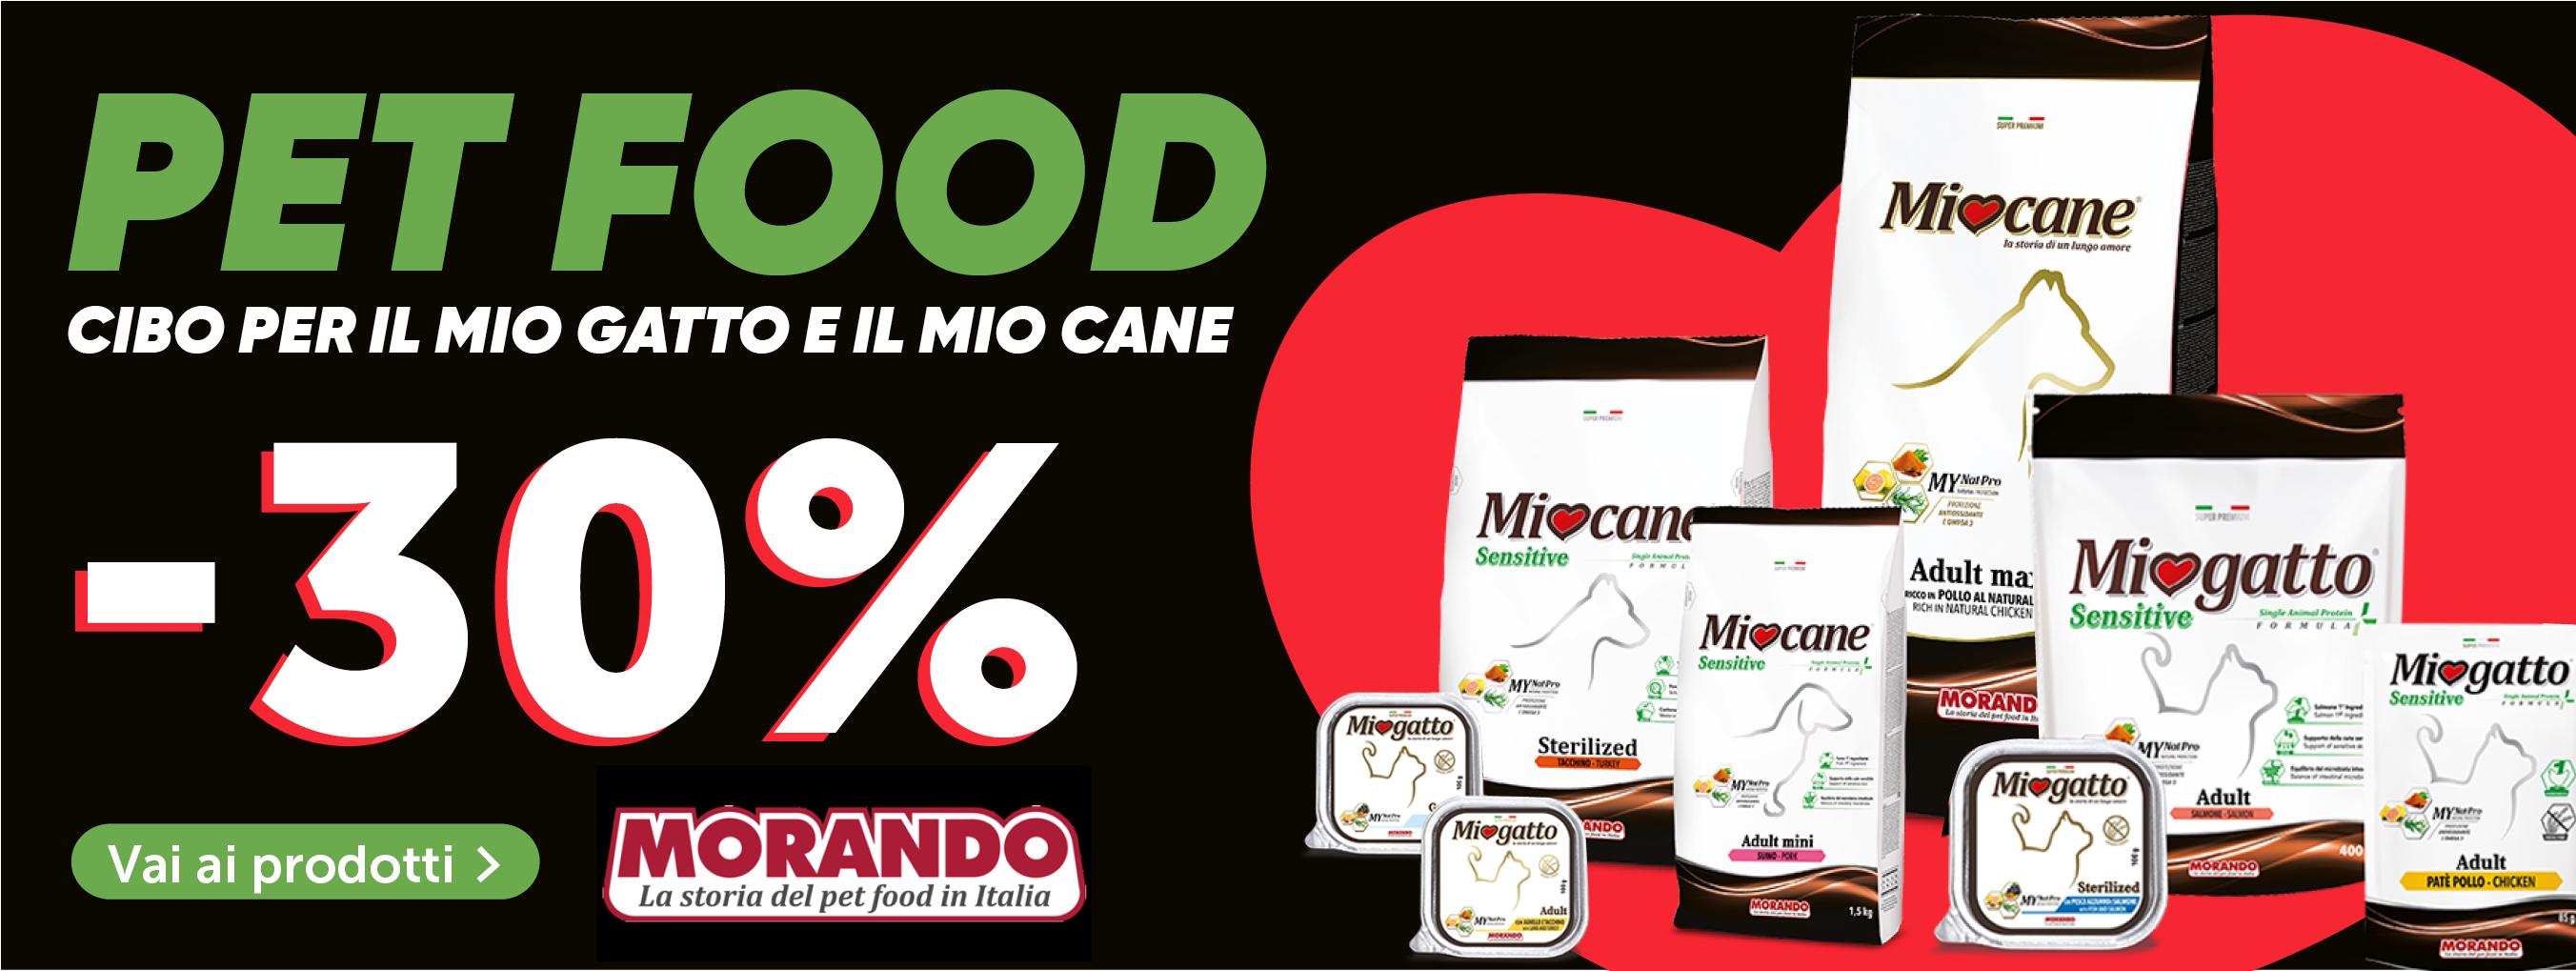 promopharma-lattoferrina